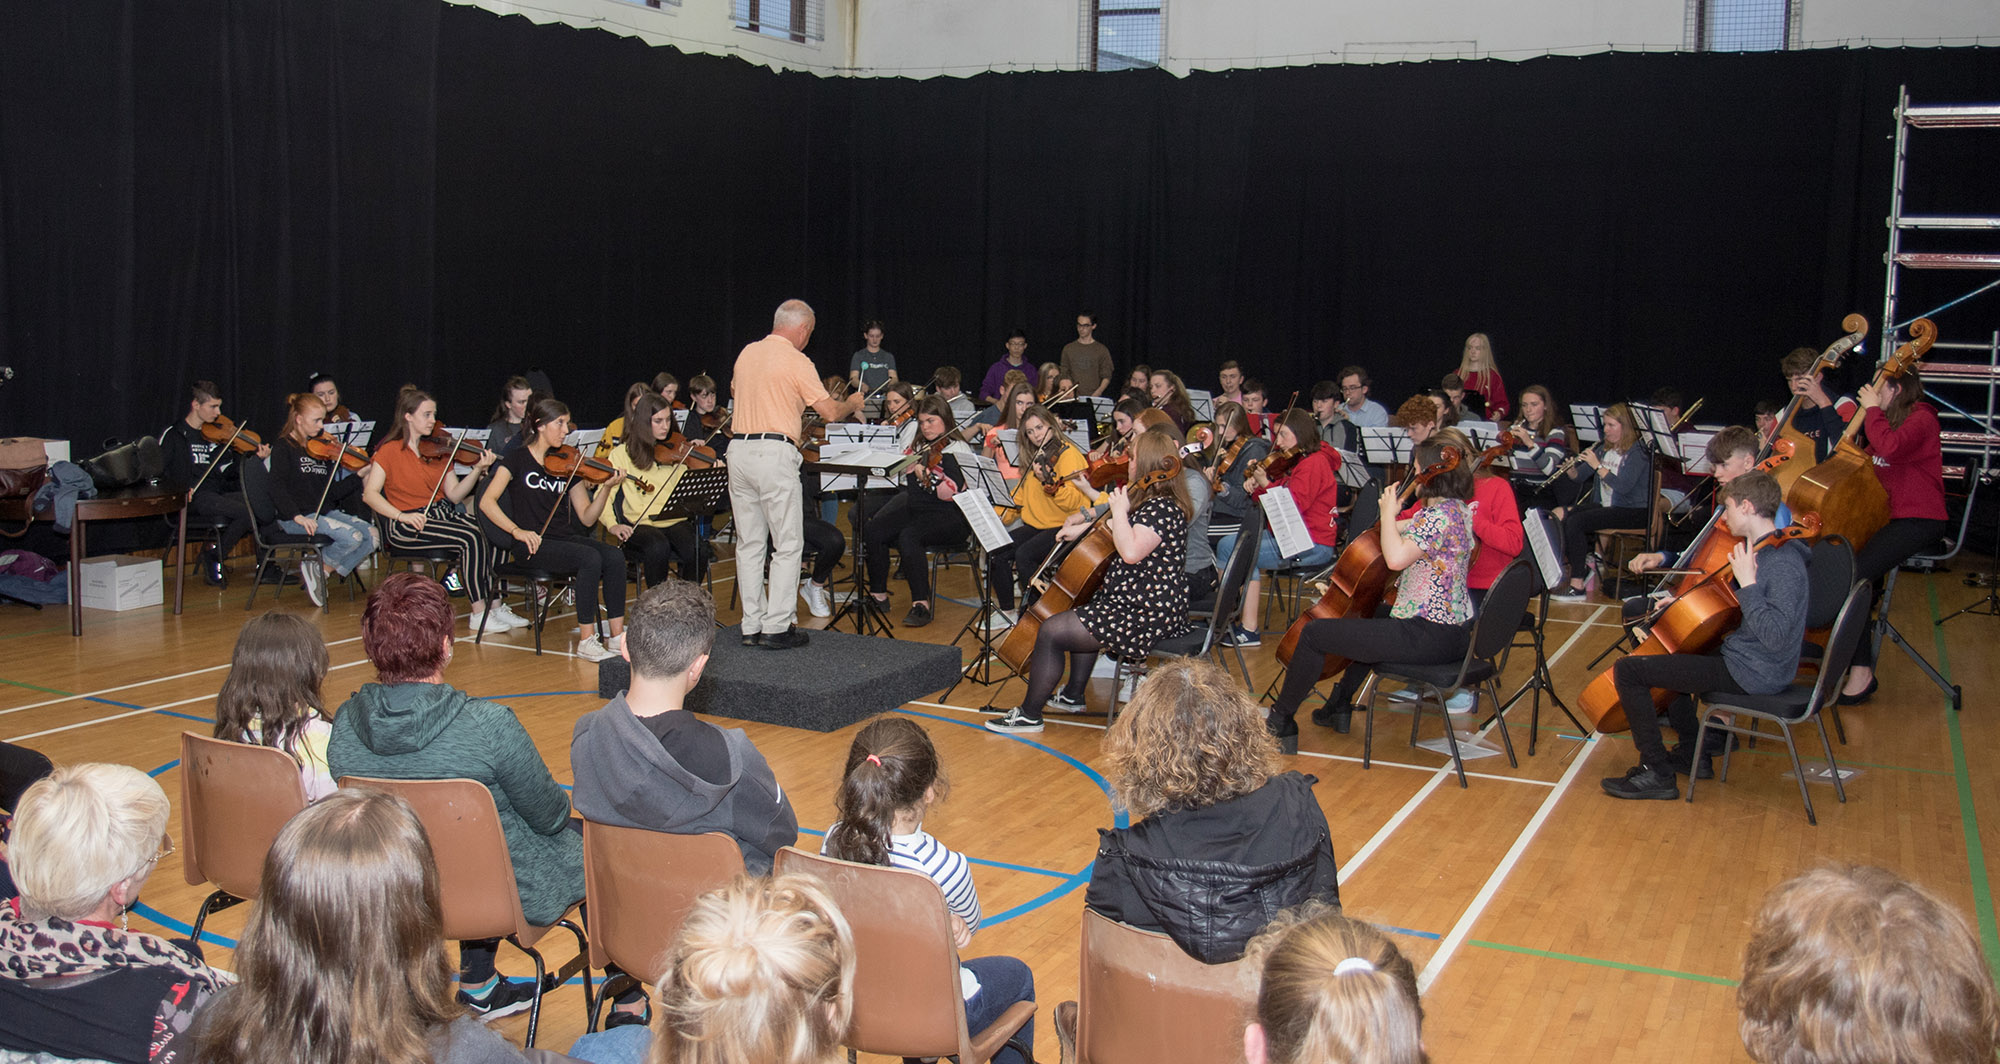 Symphonic Waves Clonbur Rehearsal - Conductor James Kavanagh